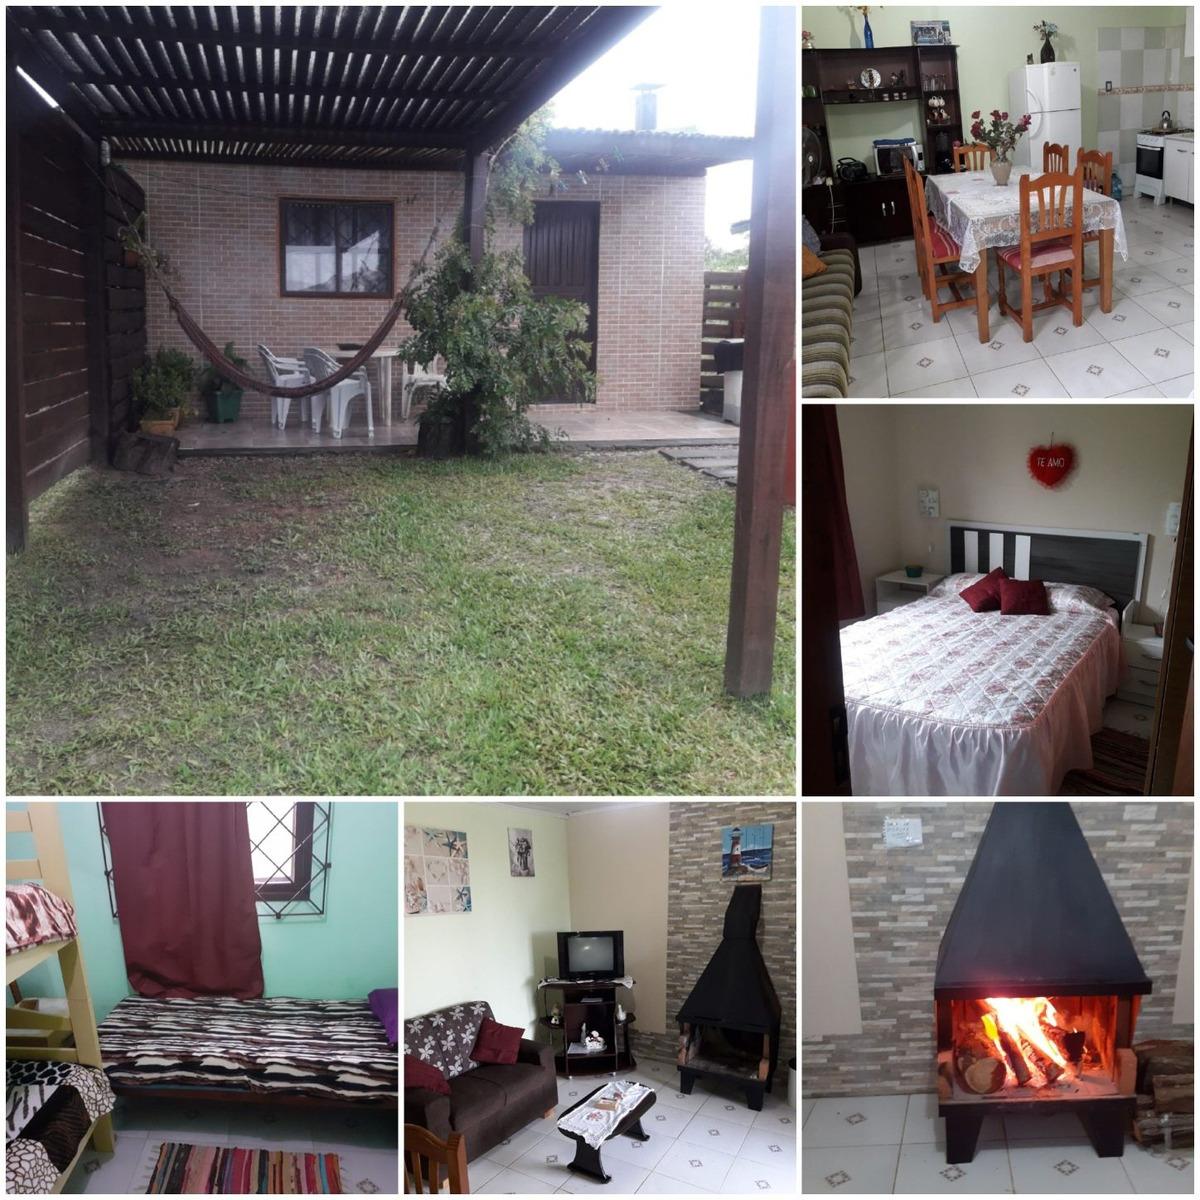 094634040  casas barra  d chuy brasilera a 3 cuadras d playa